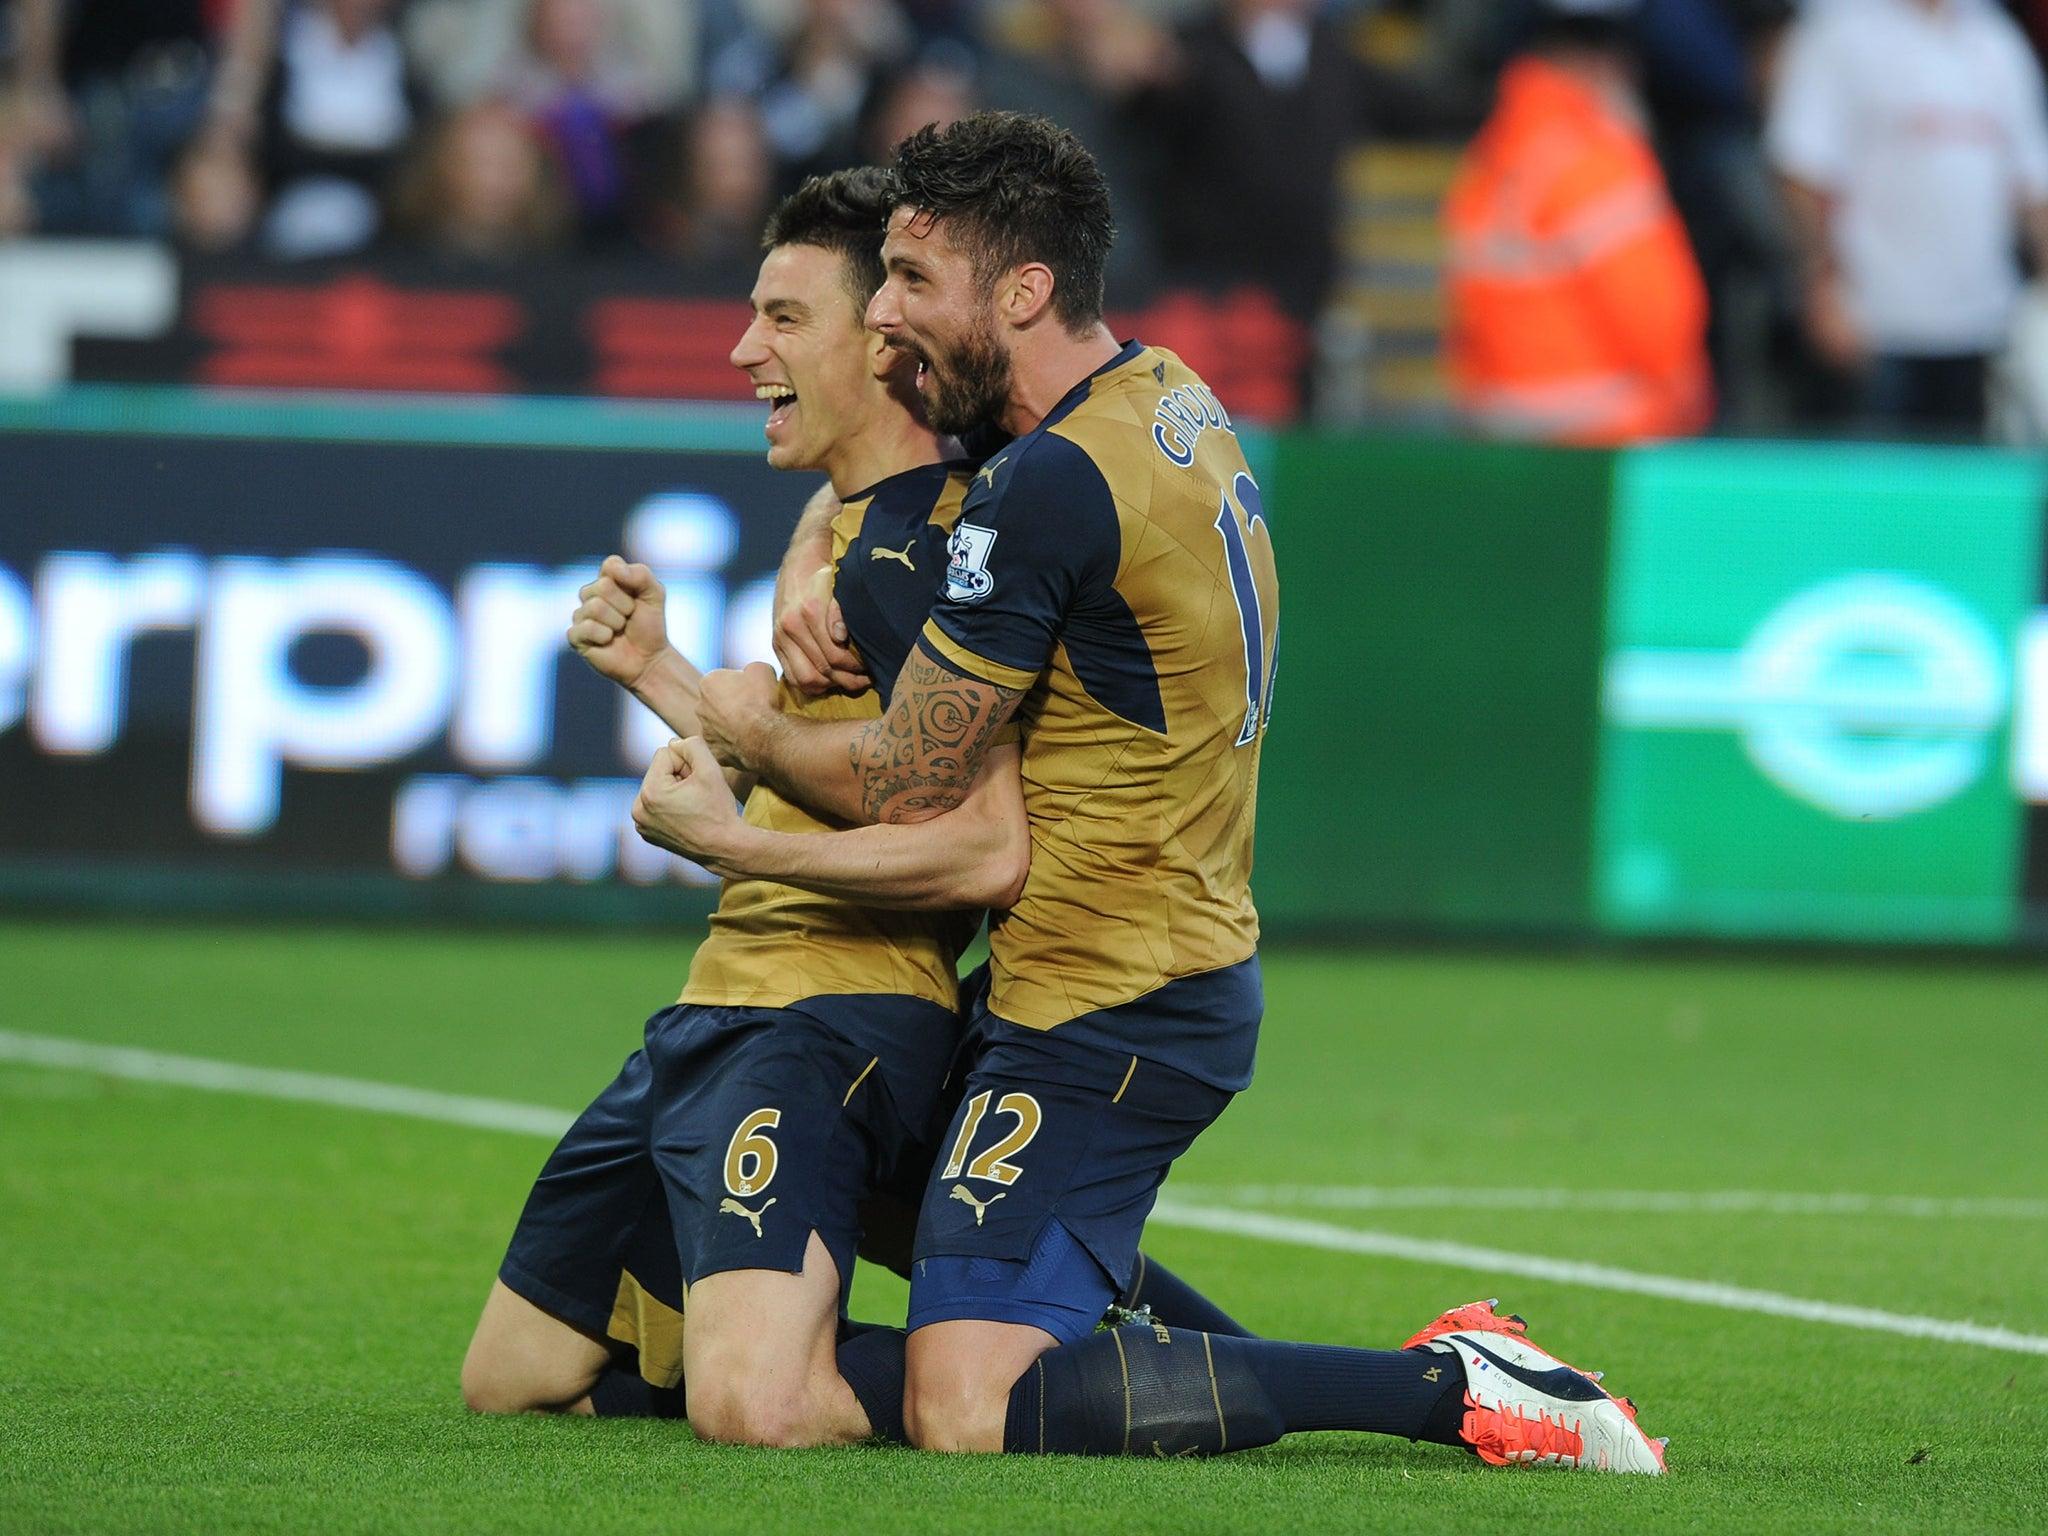 Arsenal vs Tottenham: Laurent Koscielny return essential, Spurs can probably contain Olivier Giroud